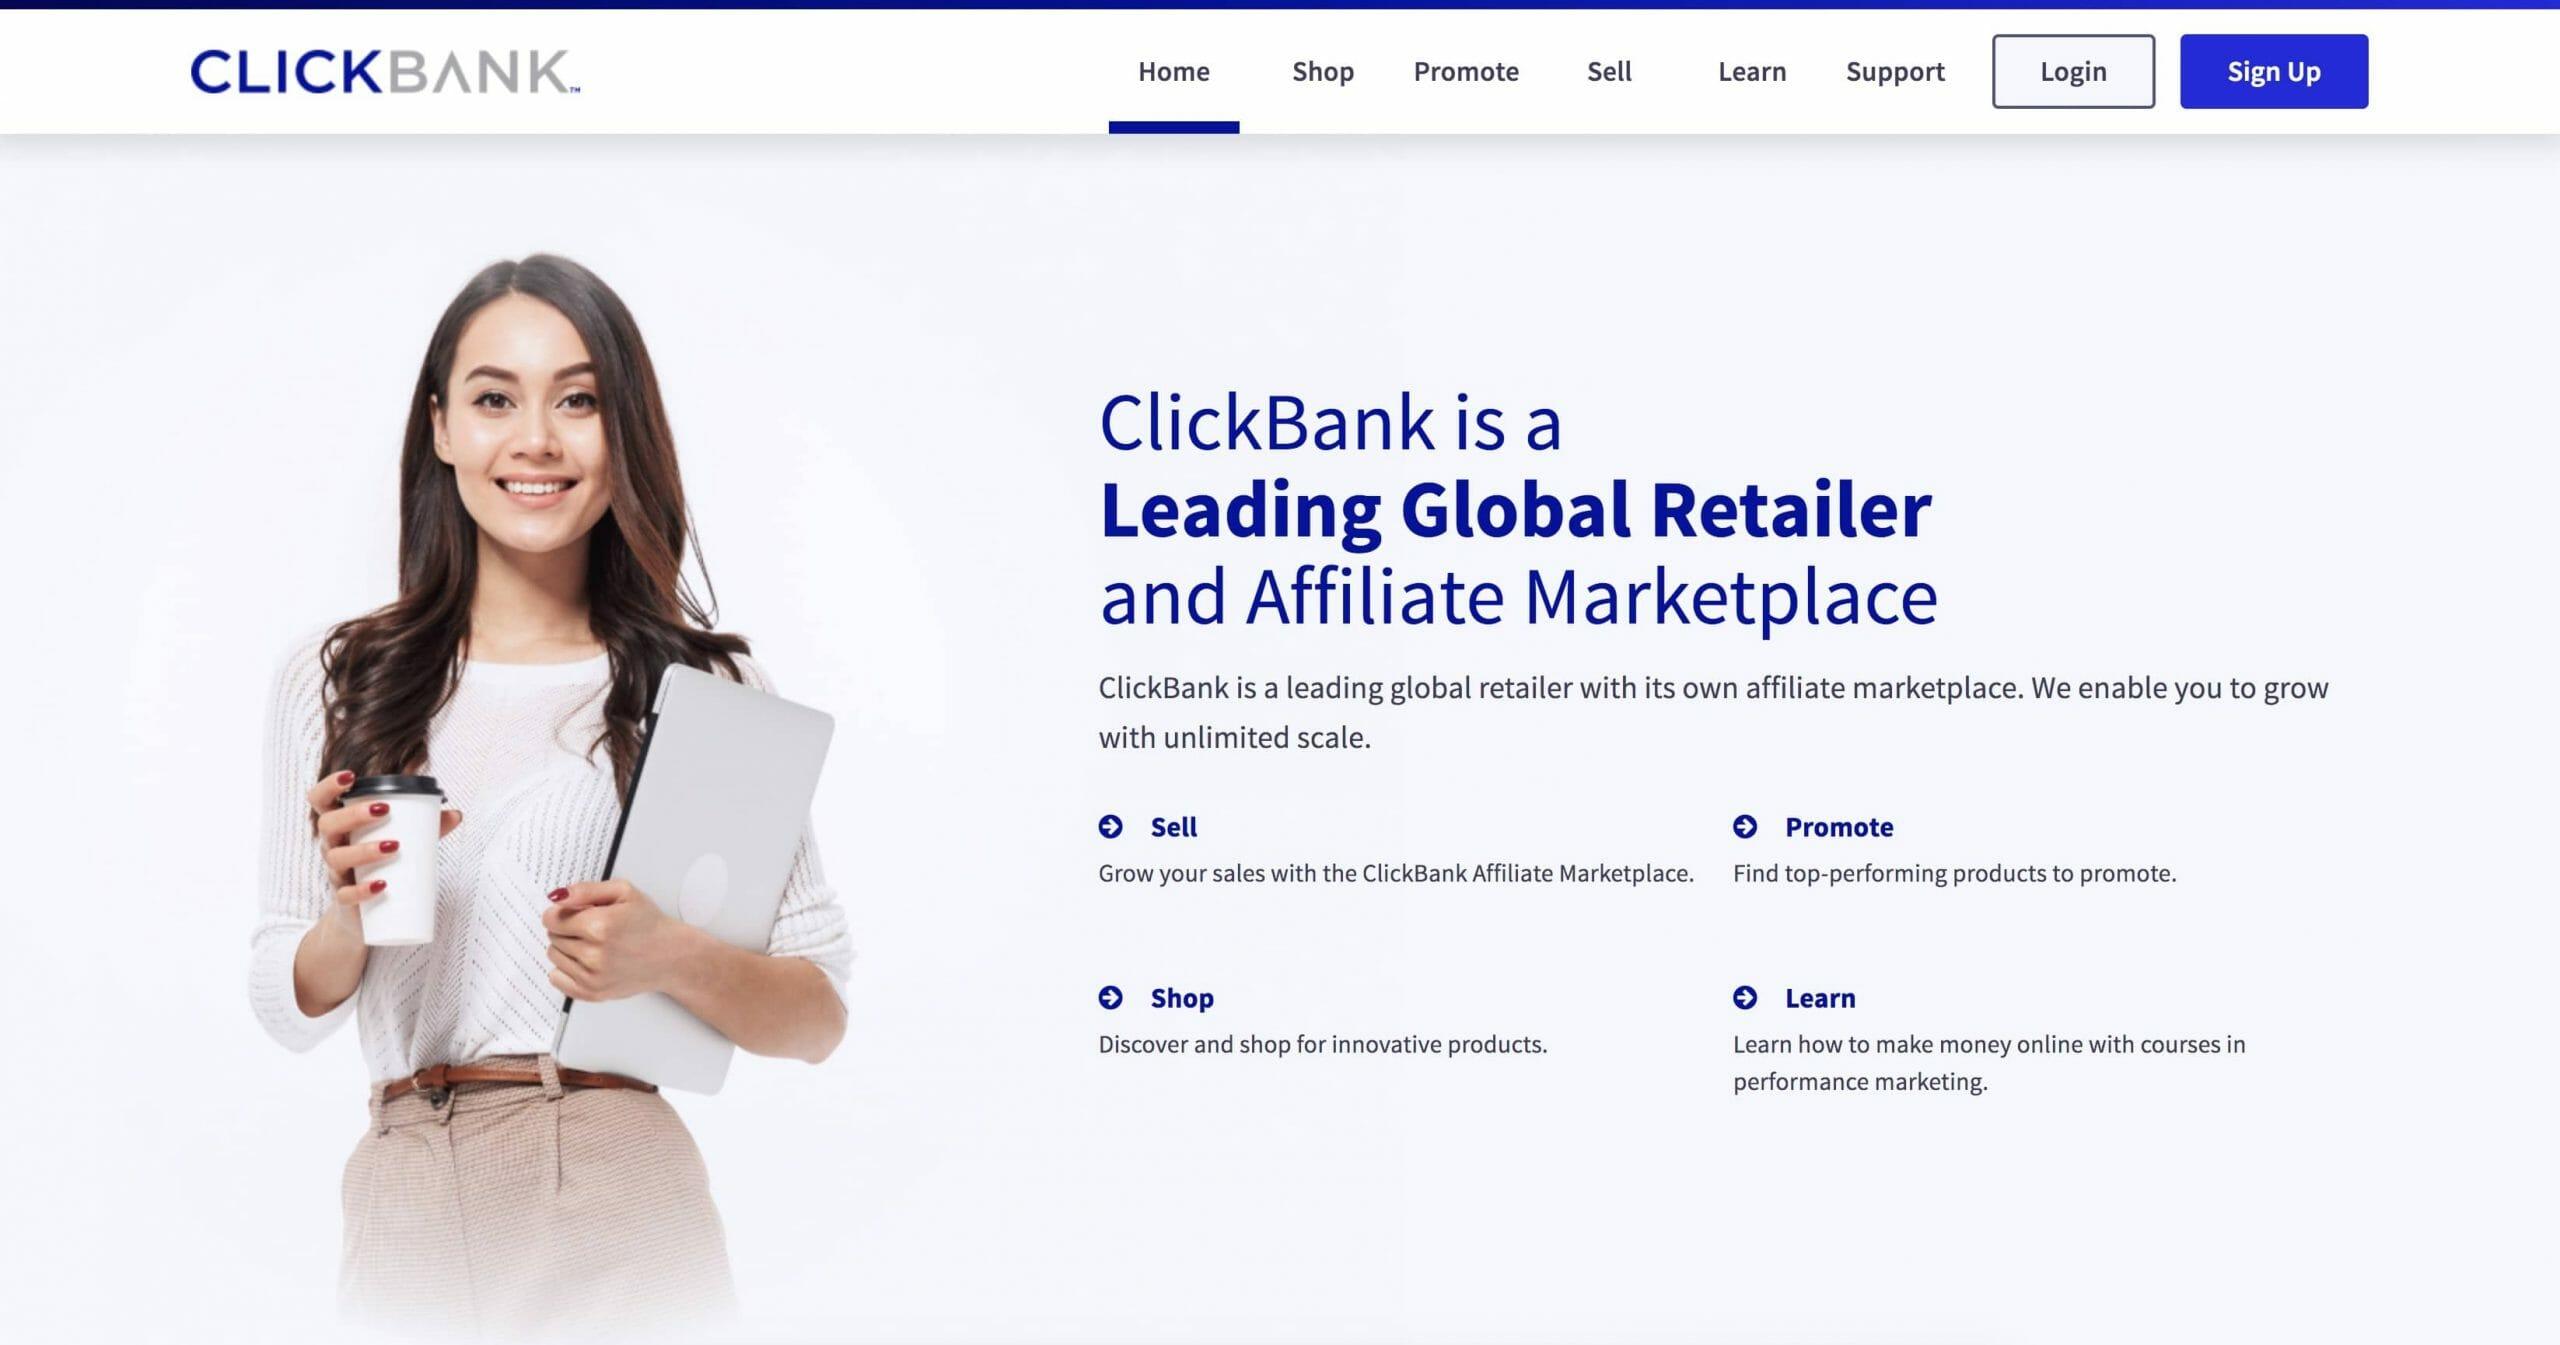 clickbank Homepage Snapshot